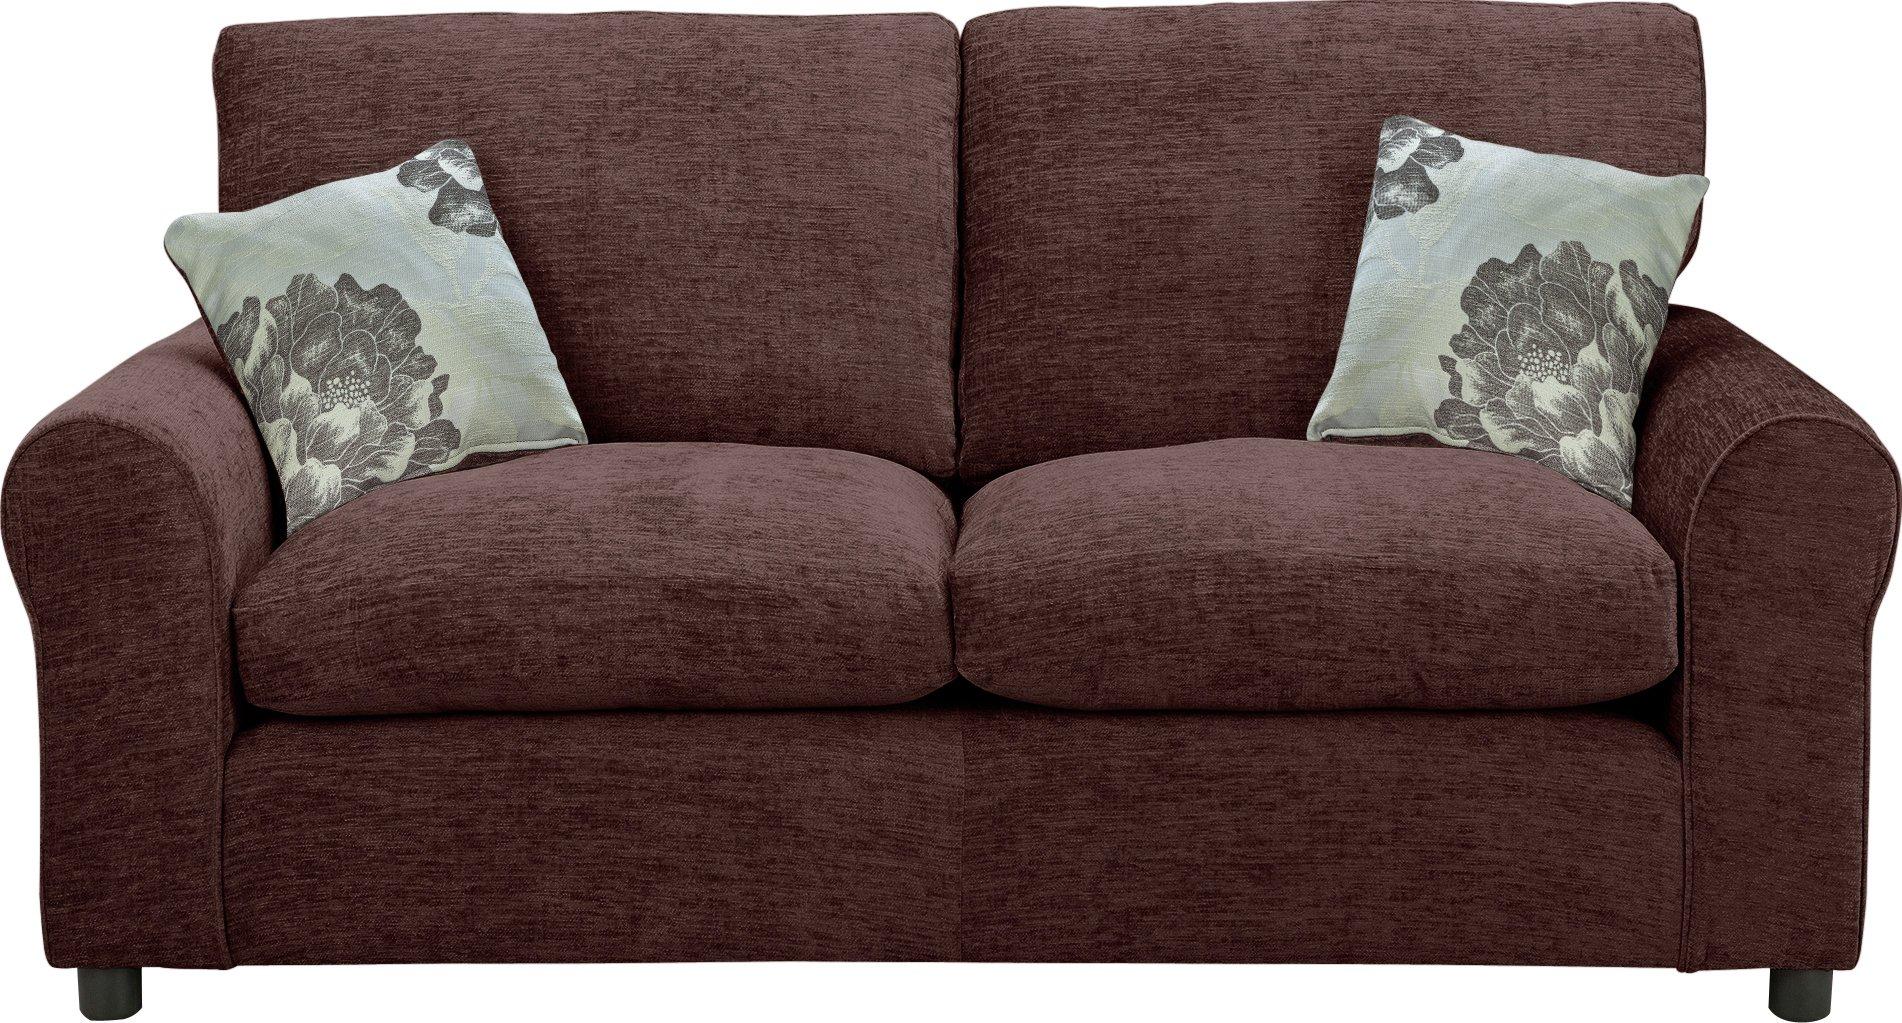 Sale On Argos Home Tessa 2 Seater Fabric Sofa Bed